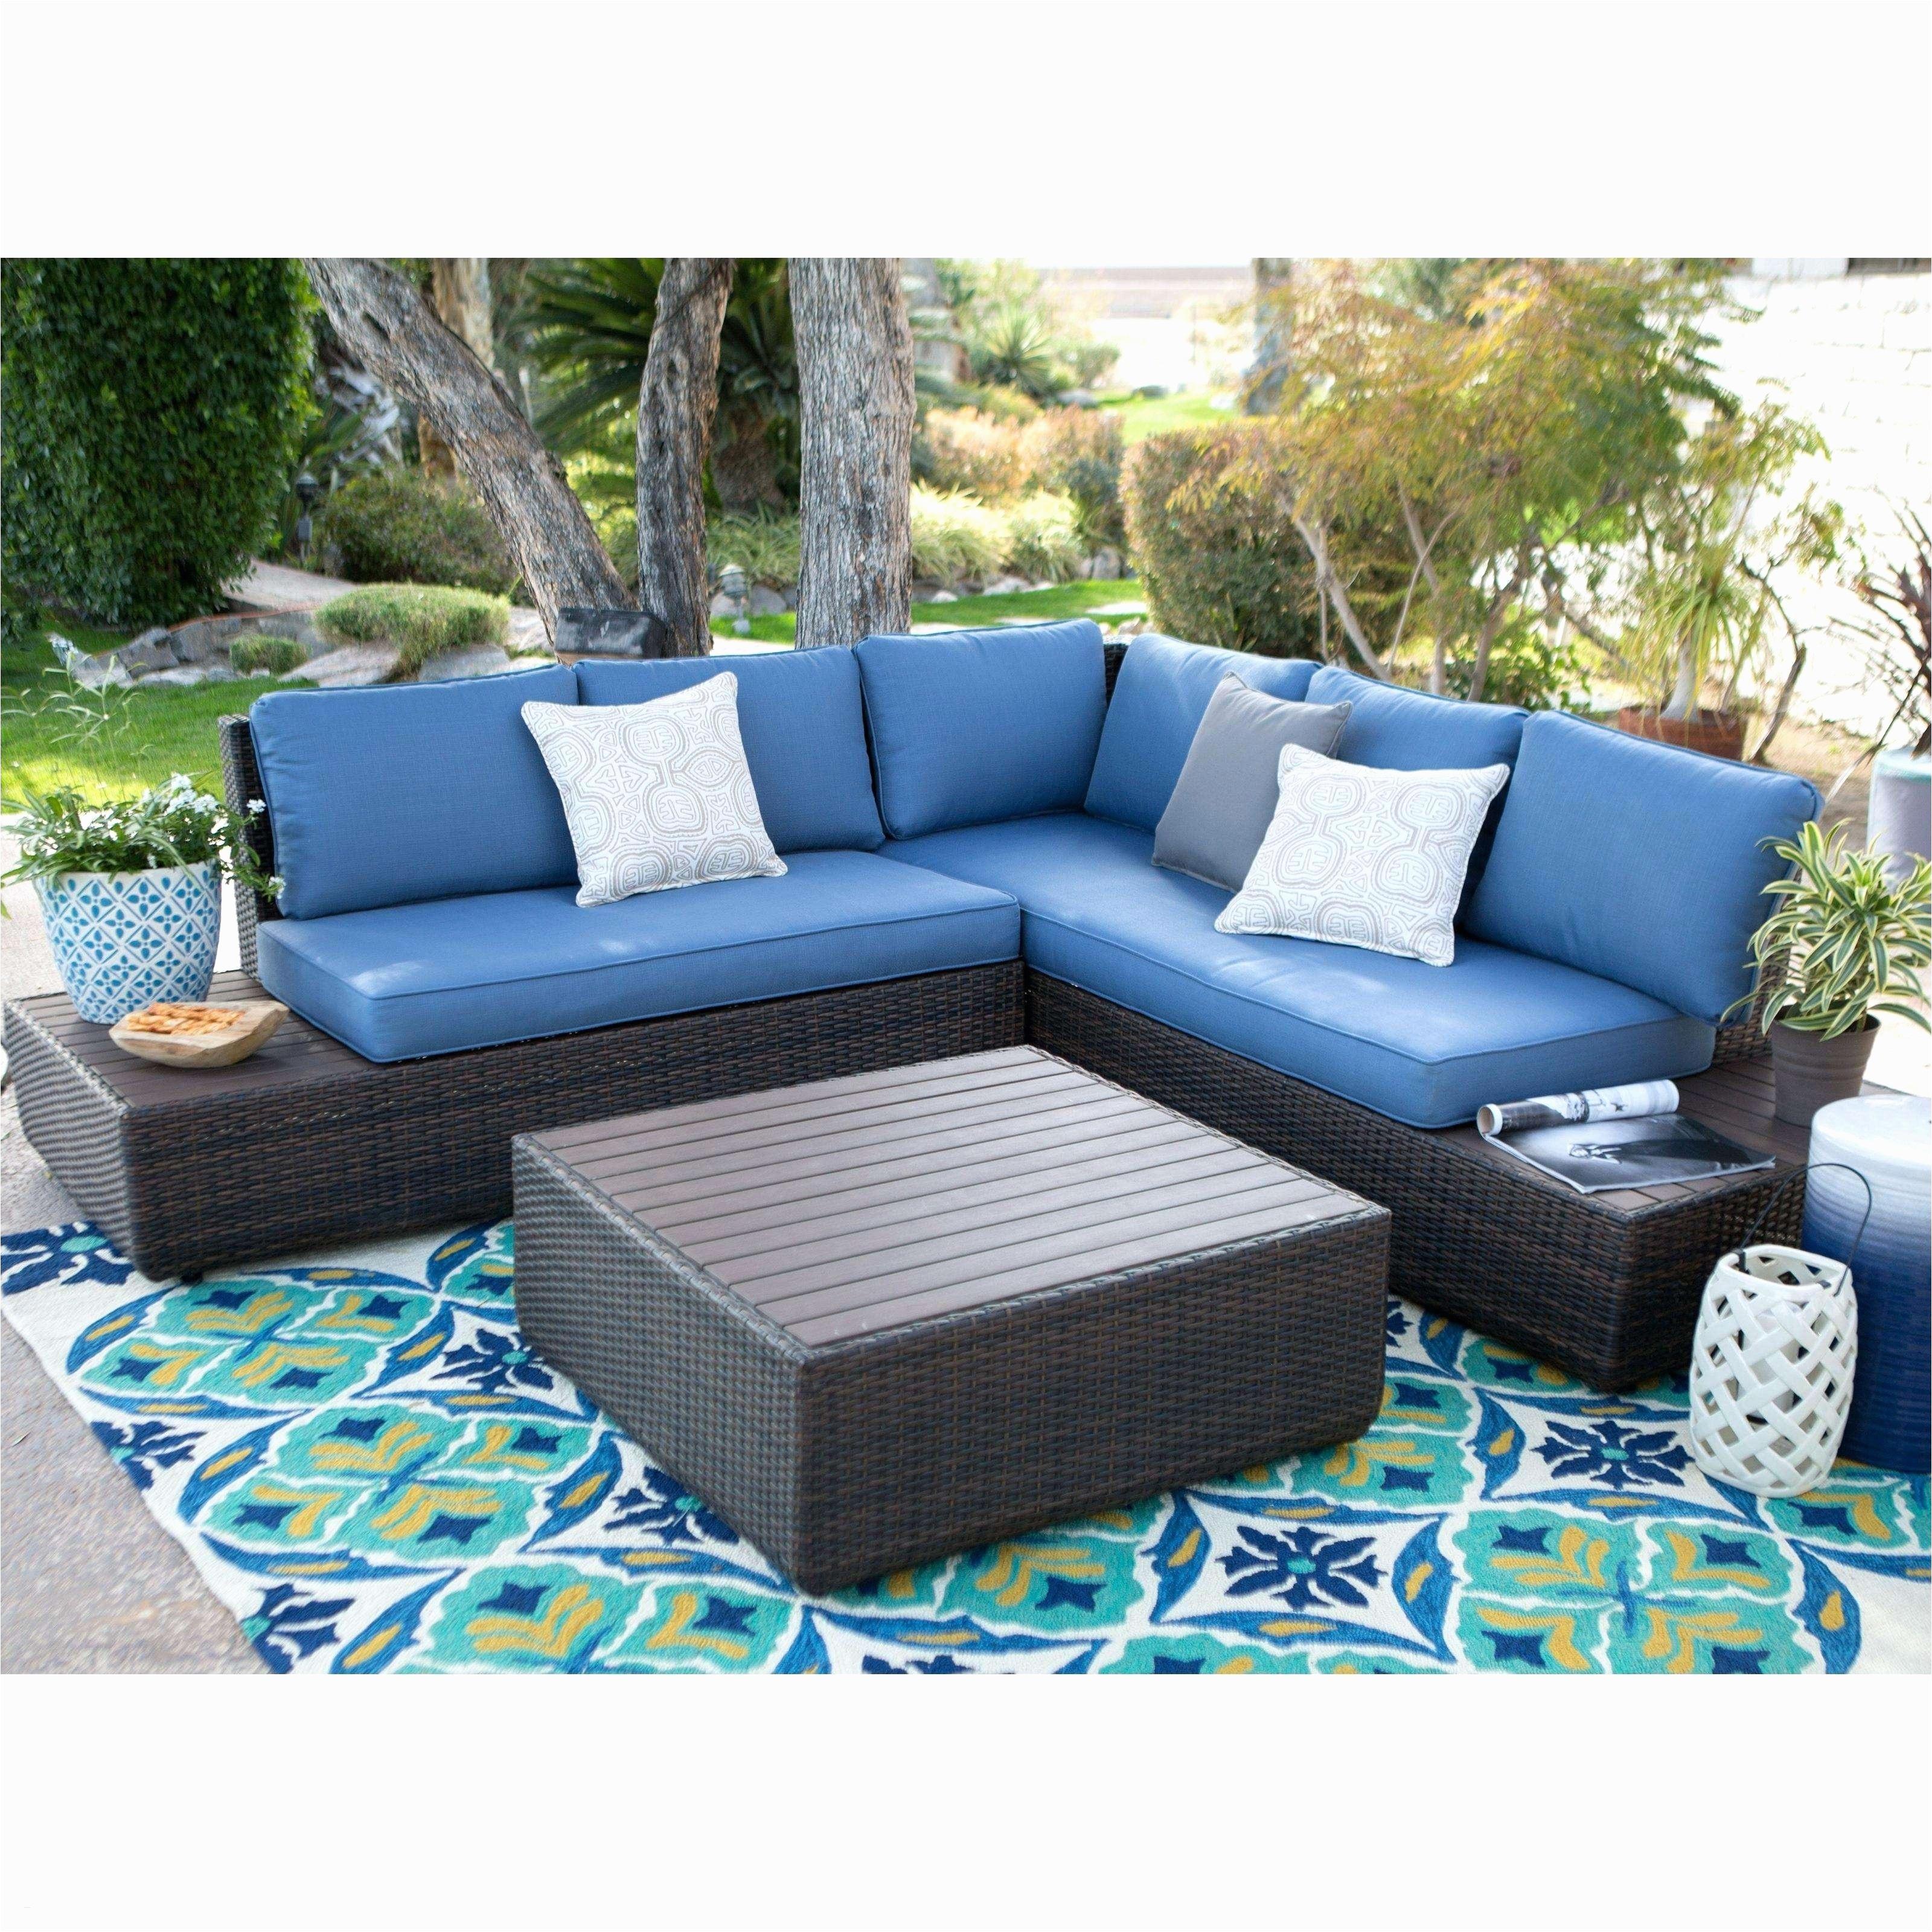 Floor Cushion with Back Grey Outdoor Cushions Unique Floor Cushion sofa Elegant Wicker